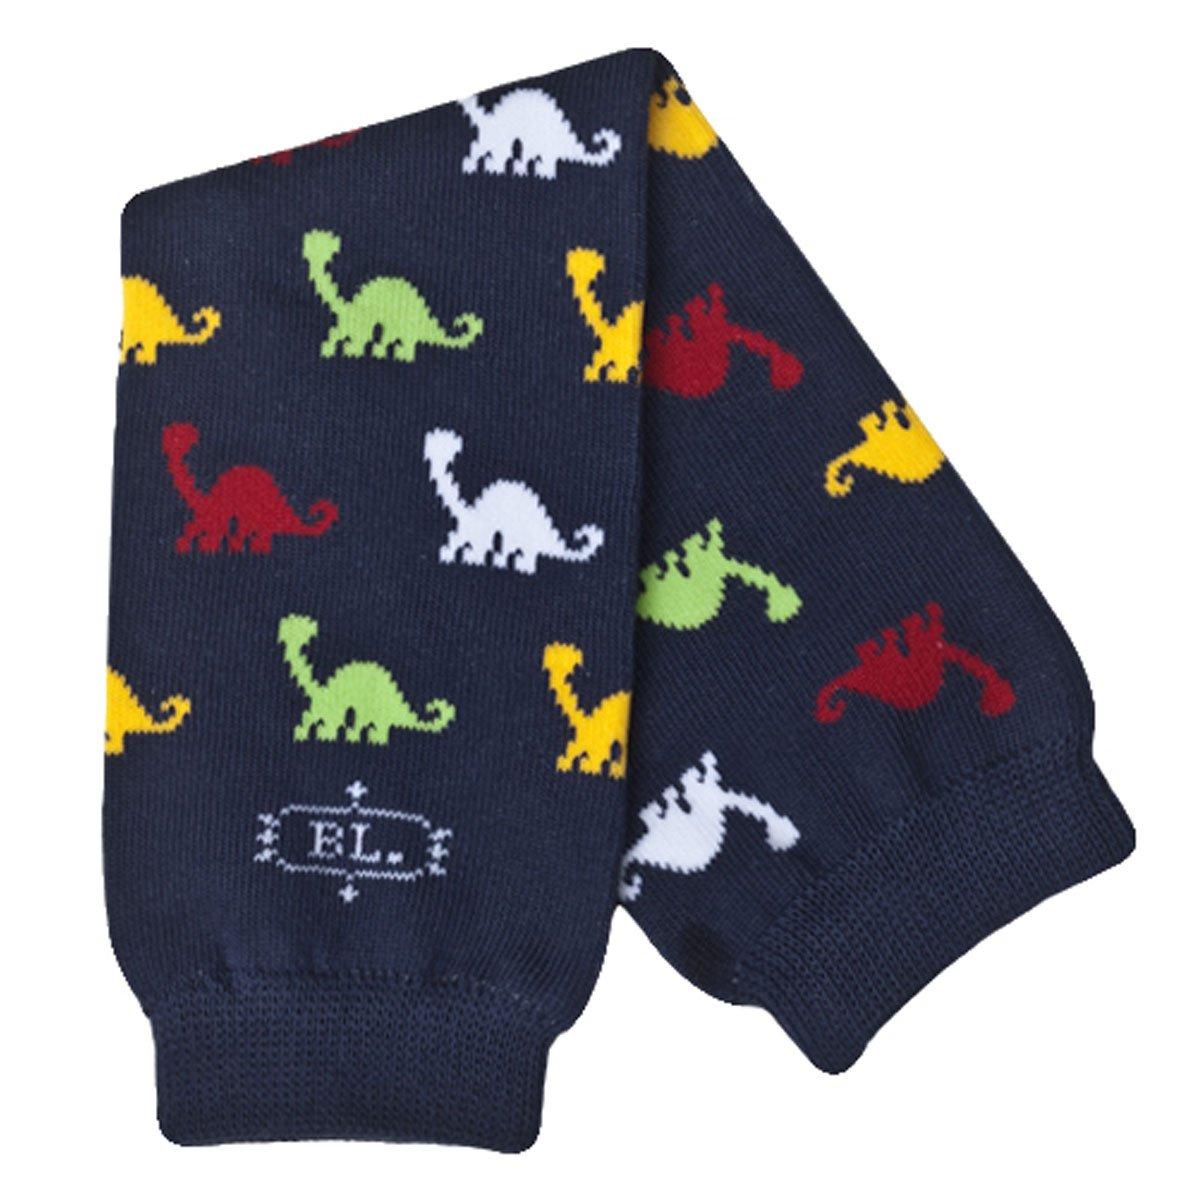 BabyLegs レッグウォーマー ボーイズ オーガニックコットン 恐竜 リトルフット ワンサイズ ワンサイズ 恐竜 B004FV68MO